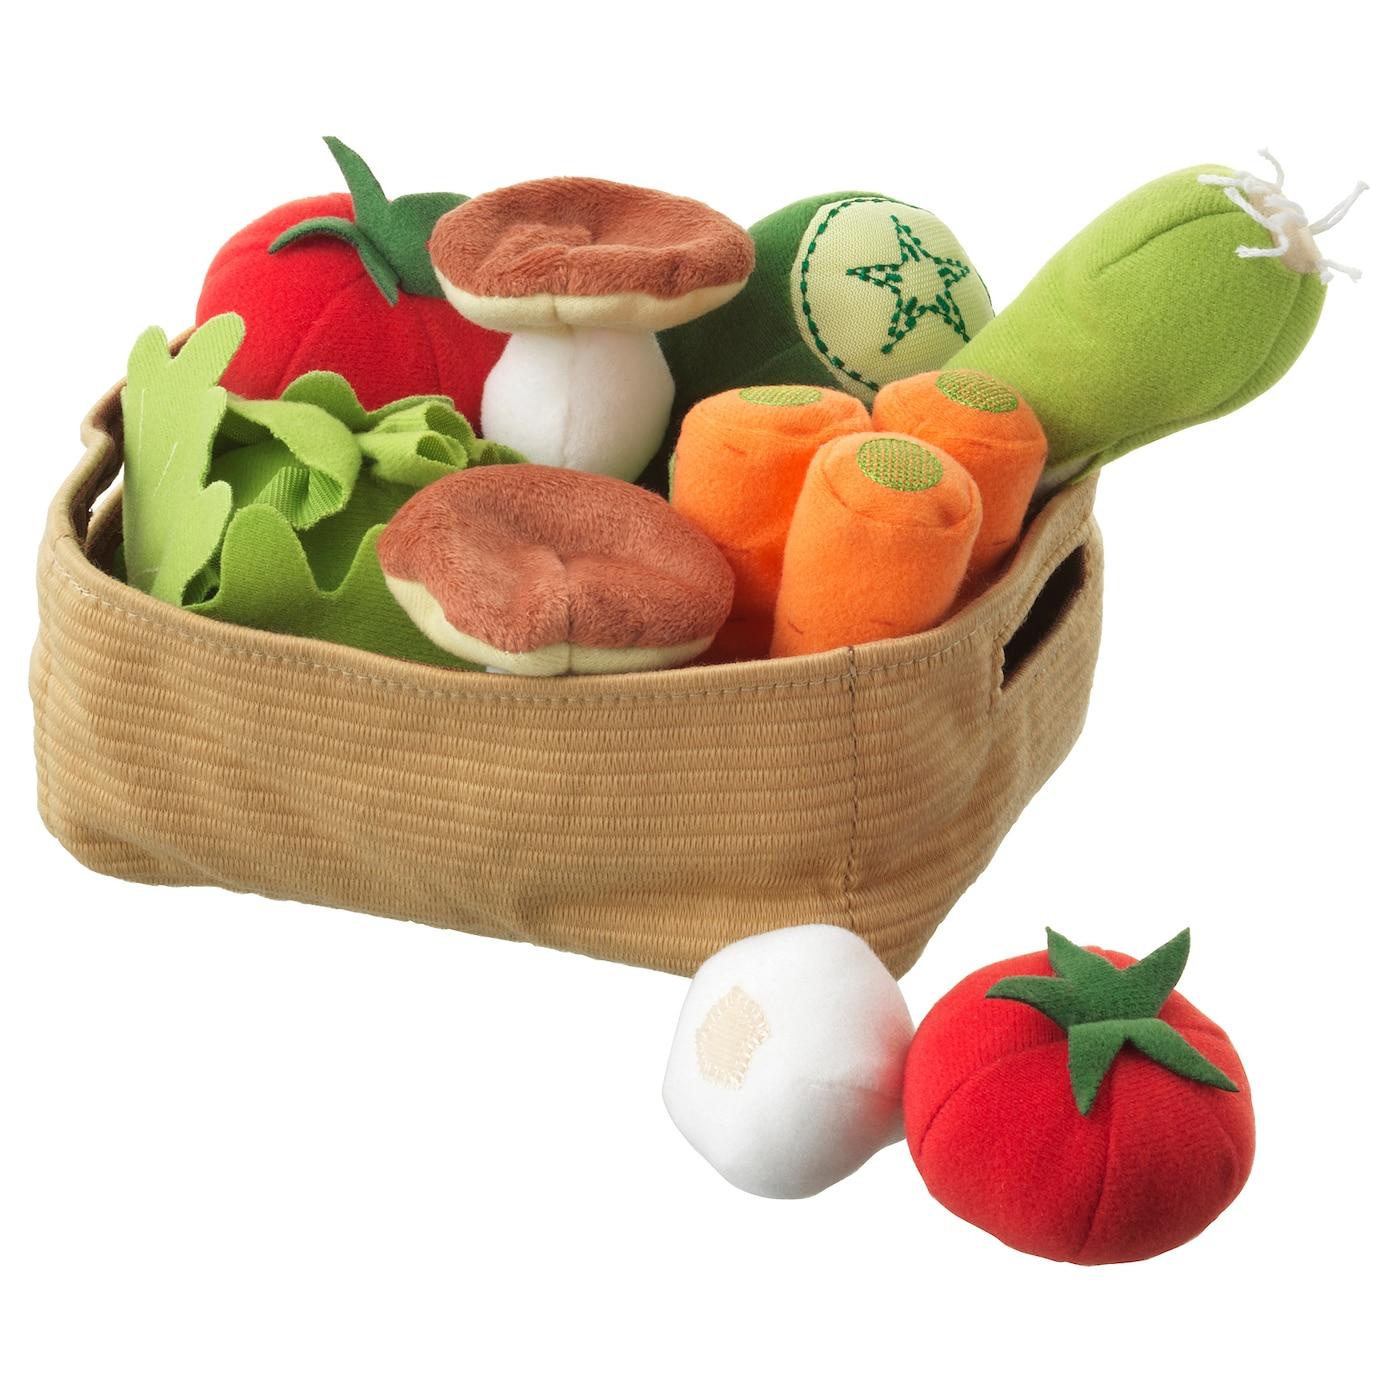 Vegetable Fruit Cookware Tools Coffee Tea Utensil Ikea DUKTIG Roleplay Toy Sets